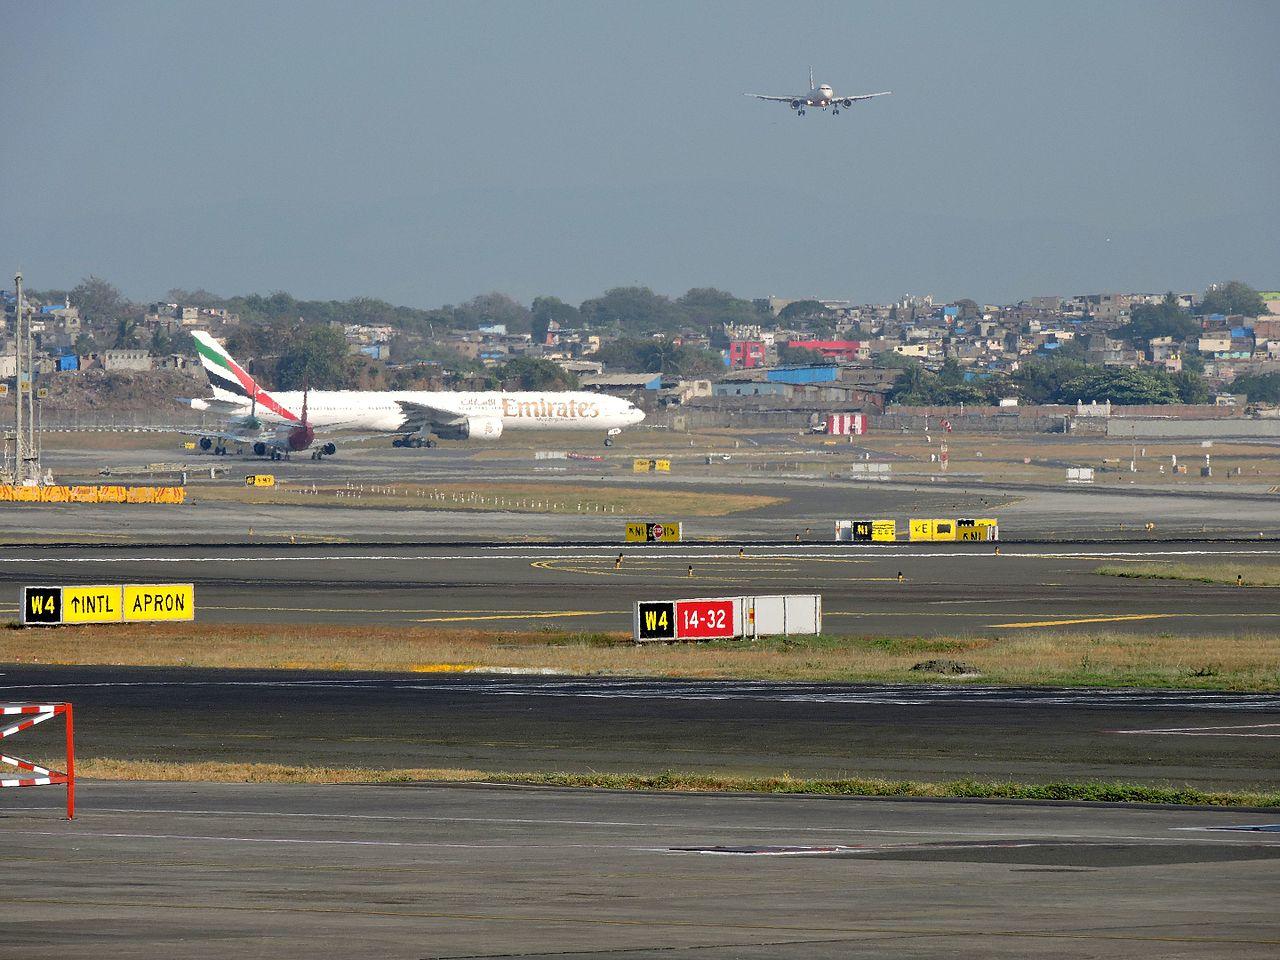 mumbai airport runway operations resume after 26 hours